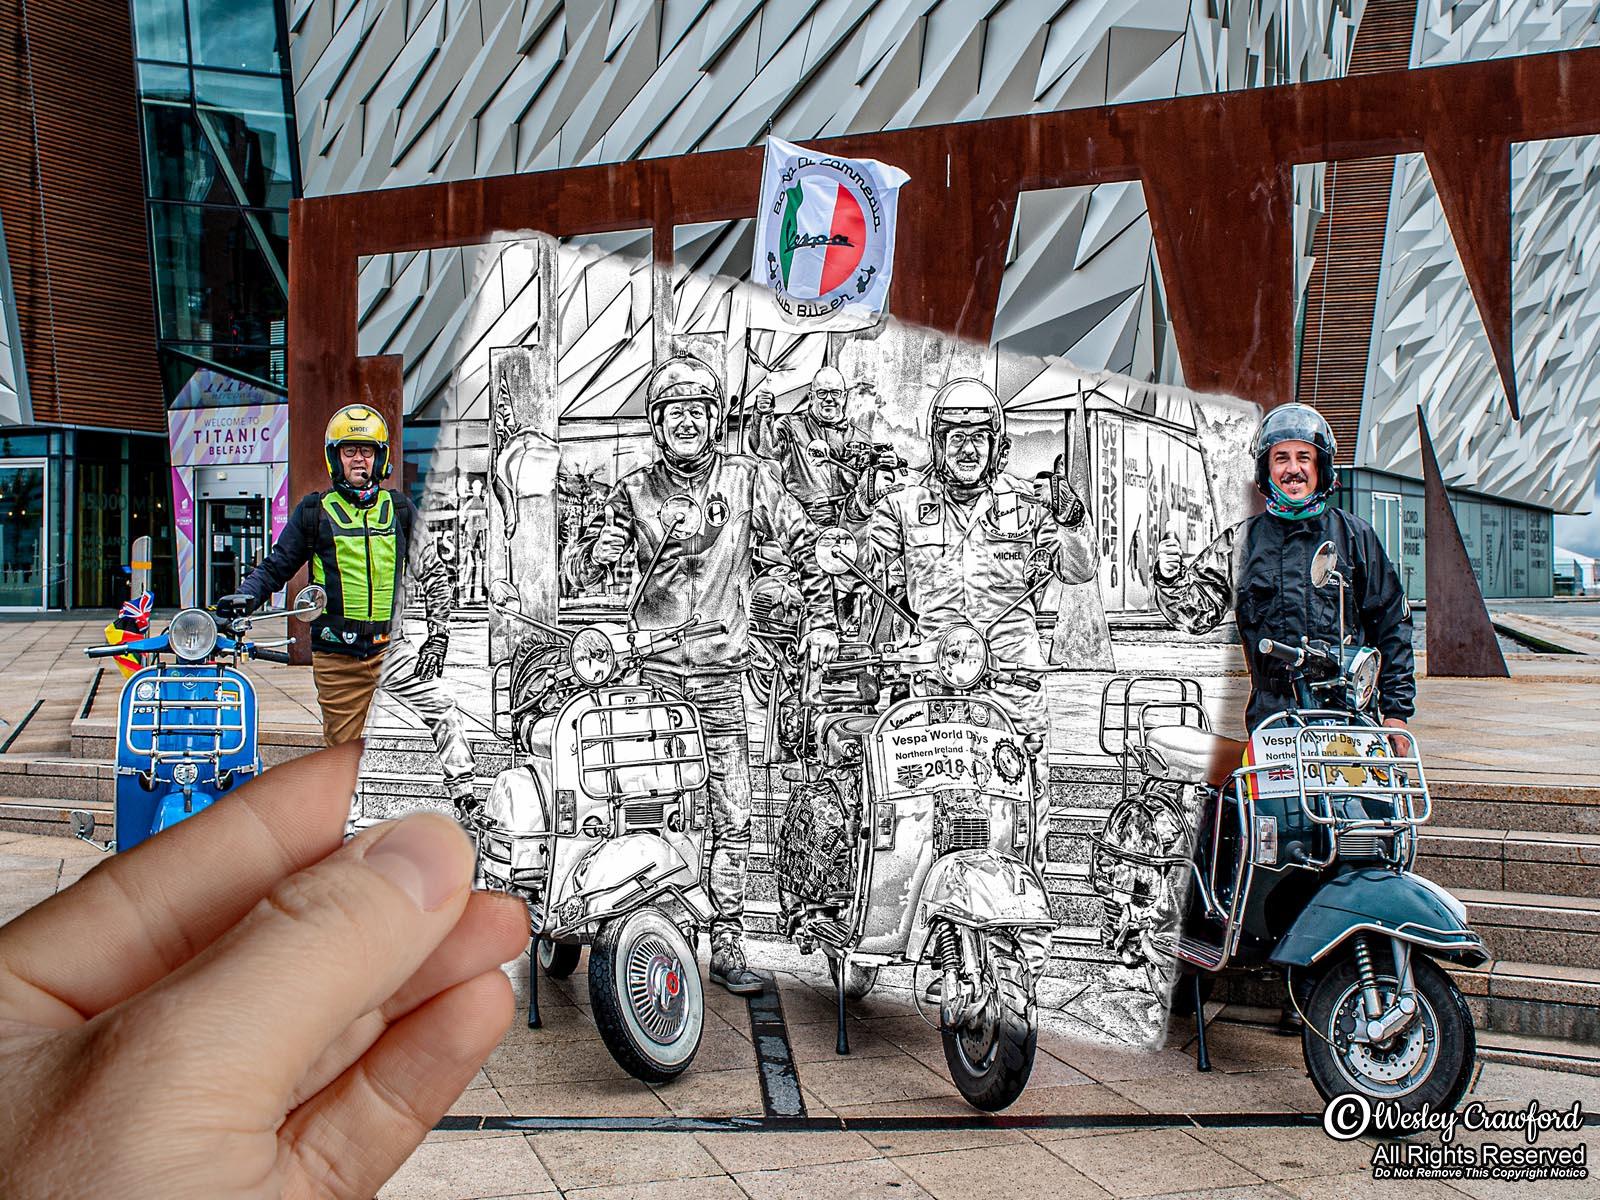 Italian Vespa Riders